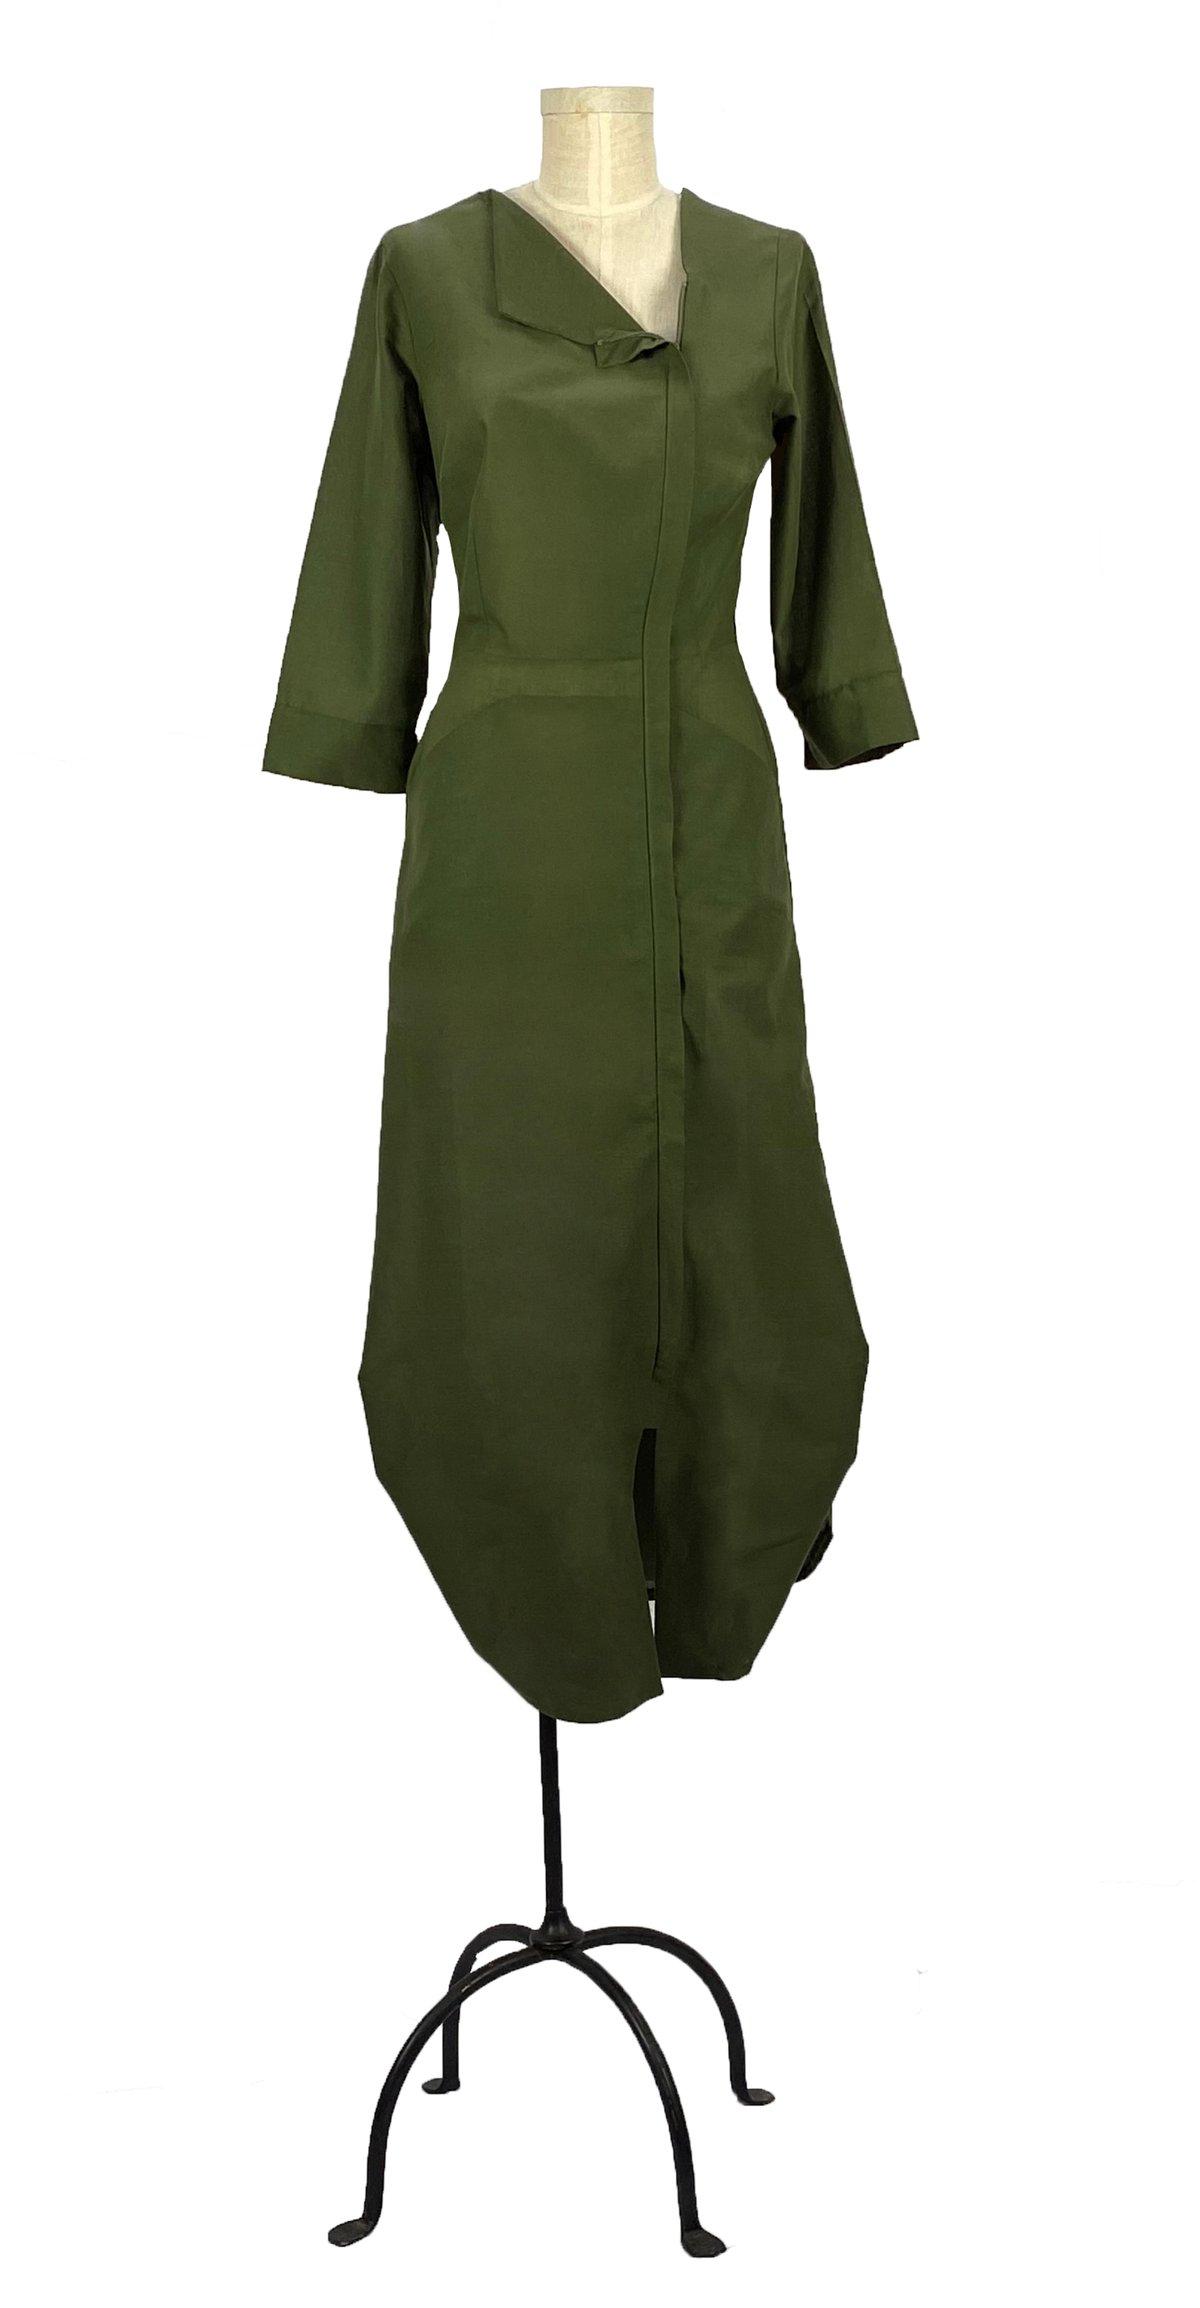 Image of artemisia dress olive